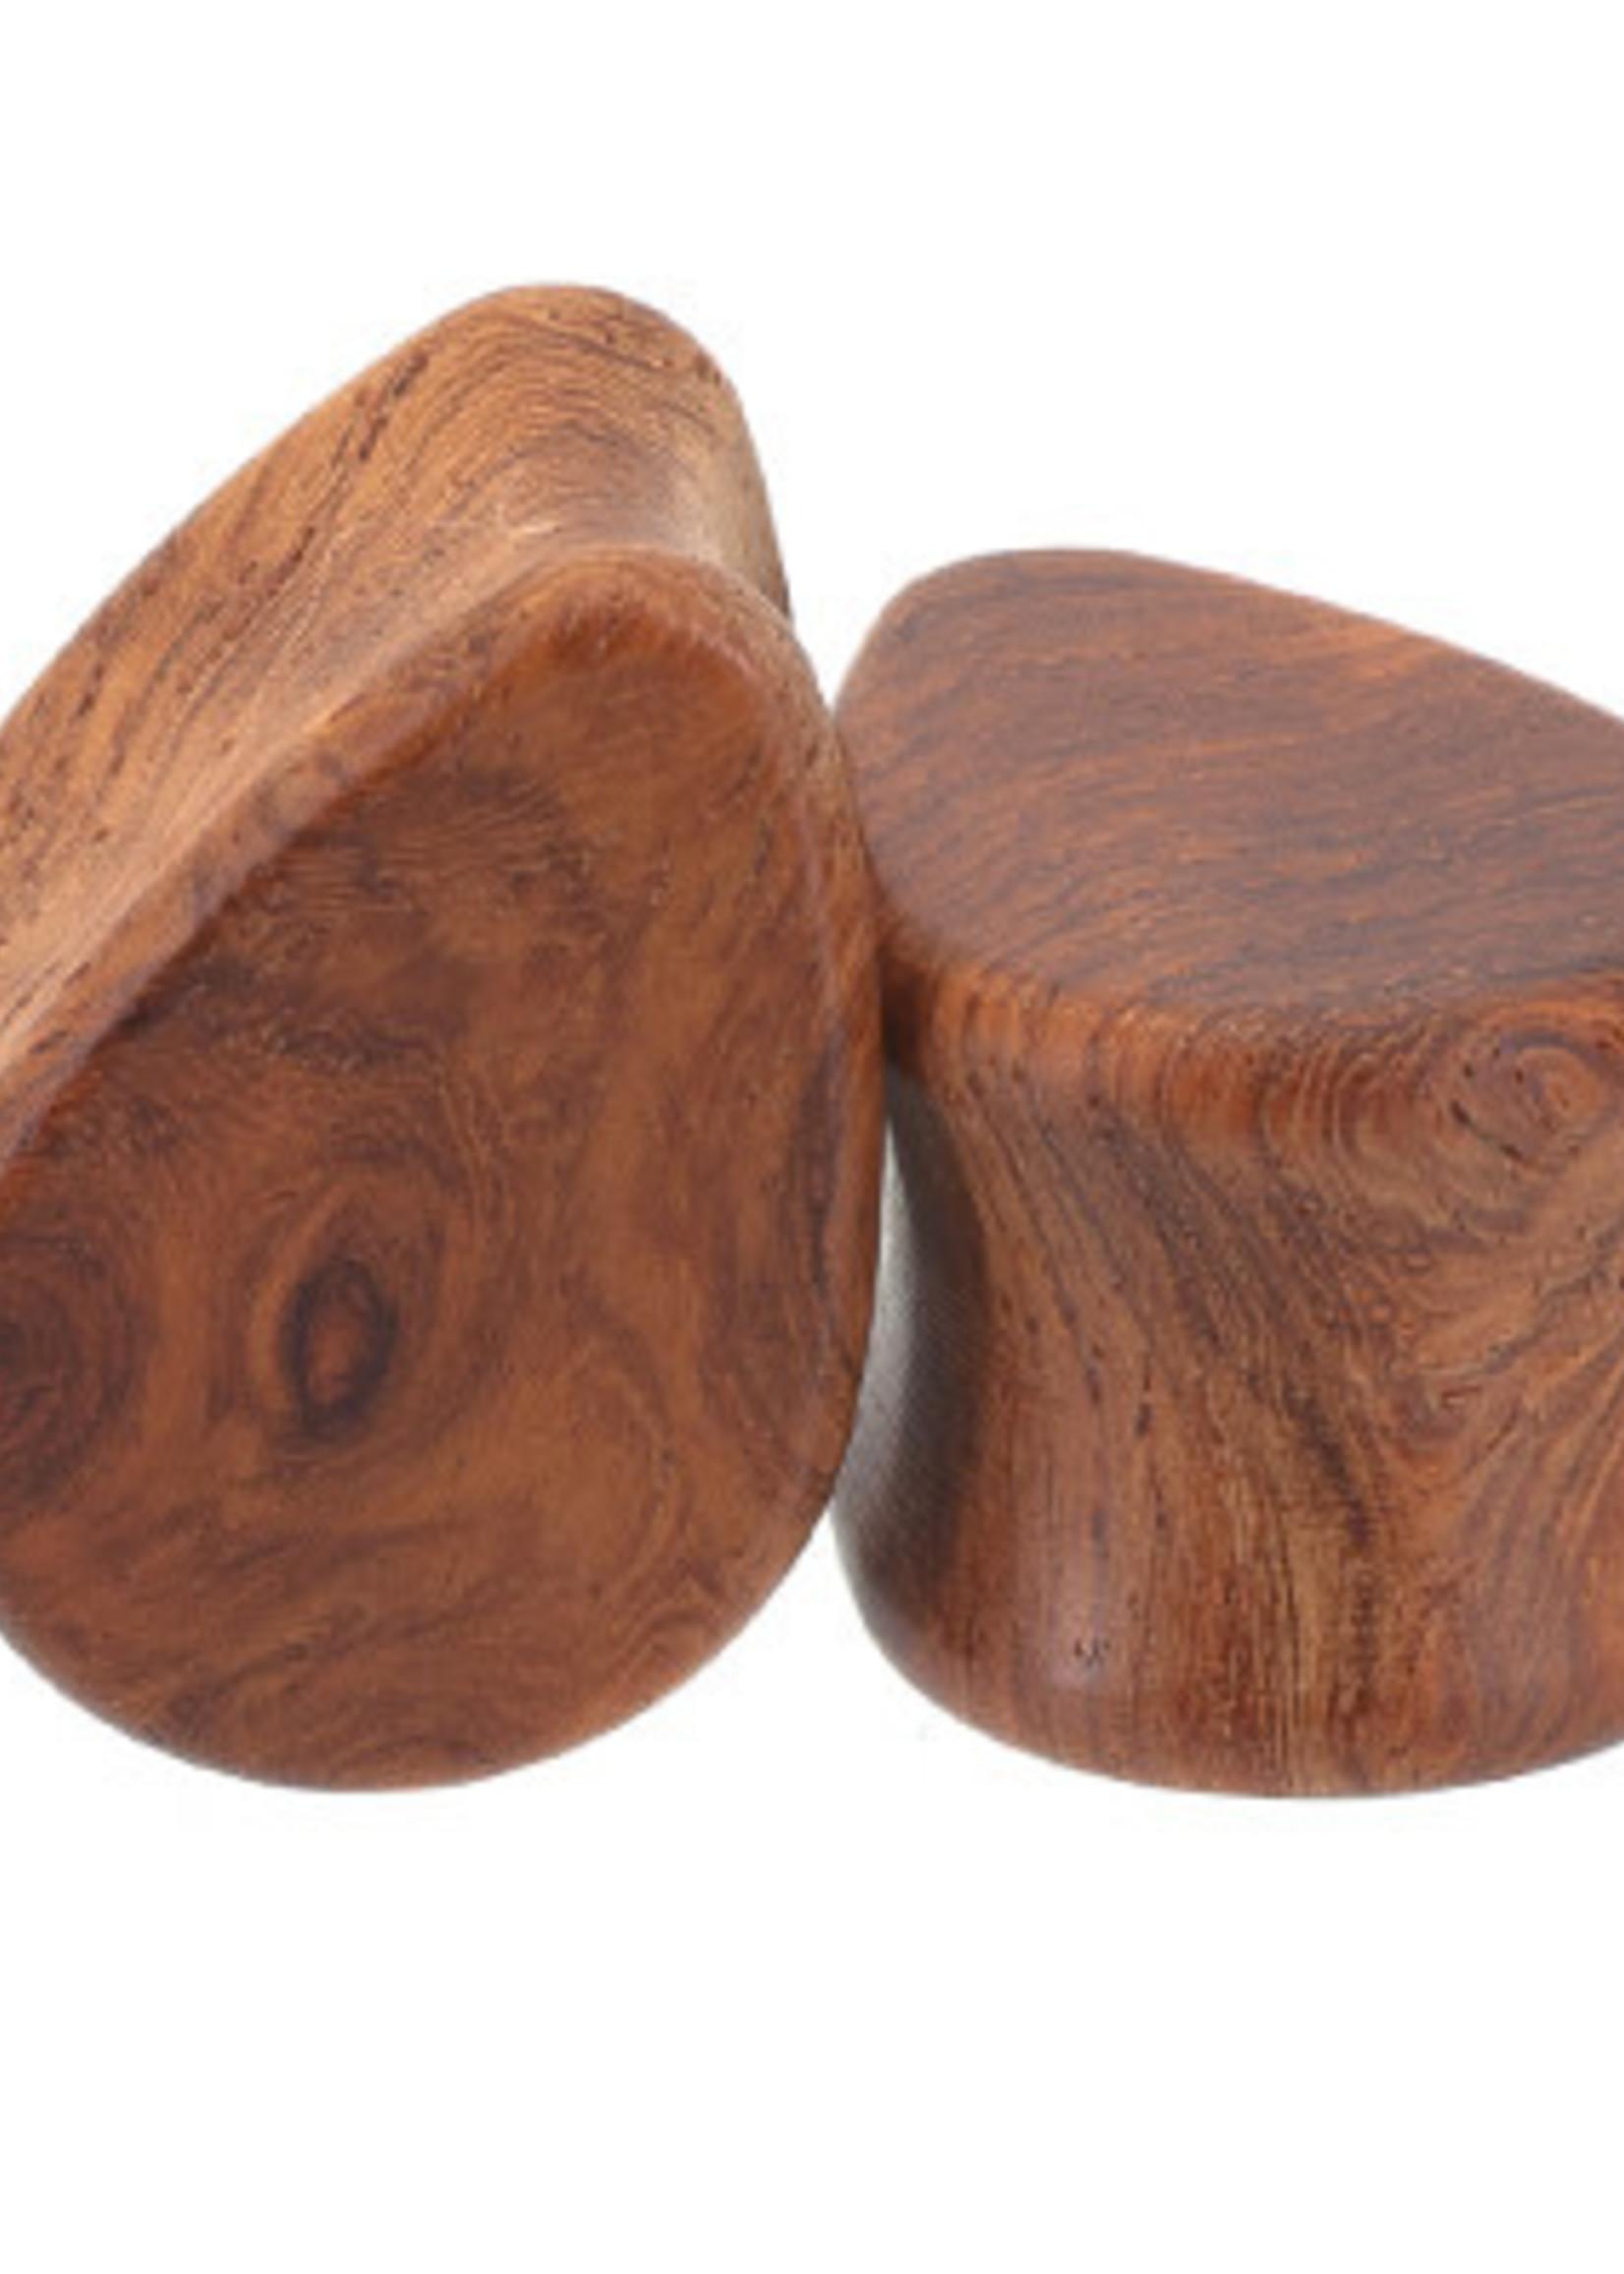 0g Amboyna Burl Wood Teardrops Plugs